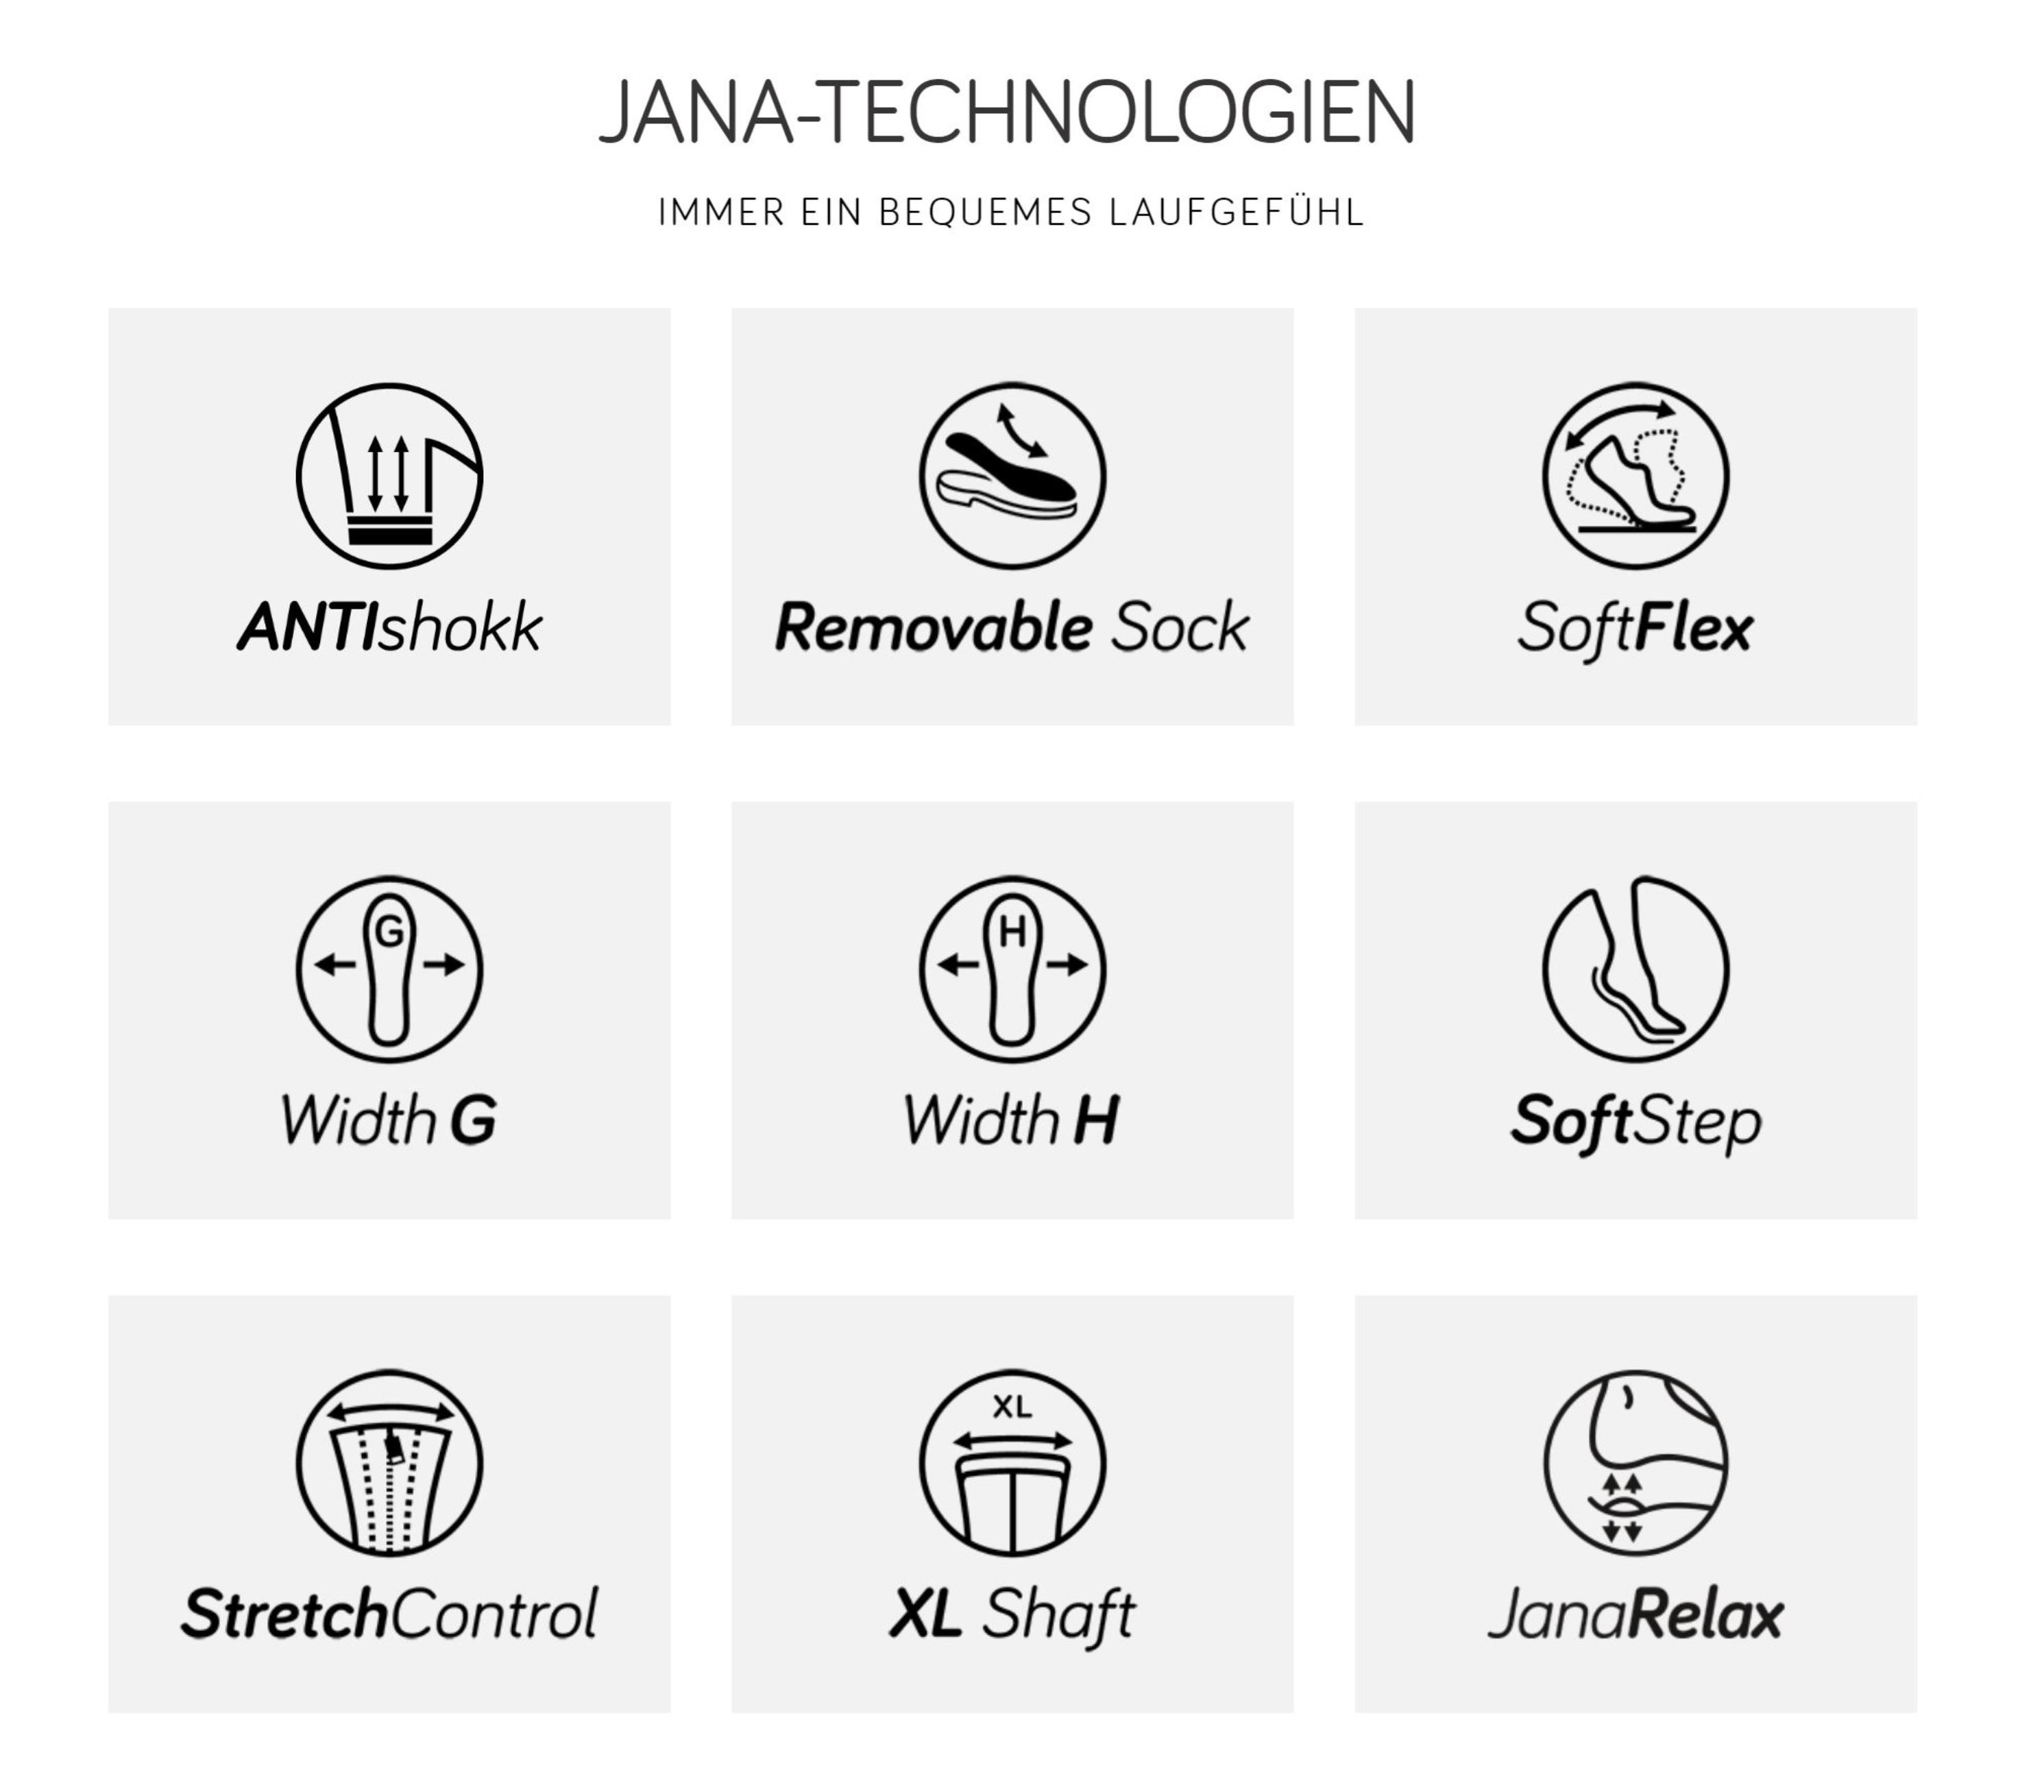 Jana_Technologien_neu